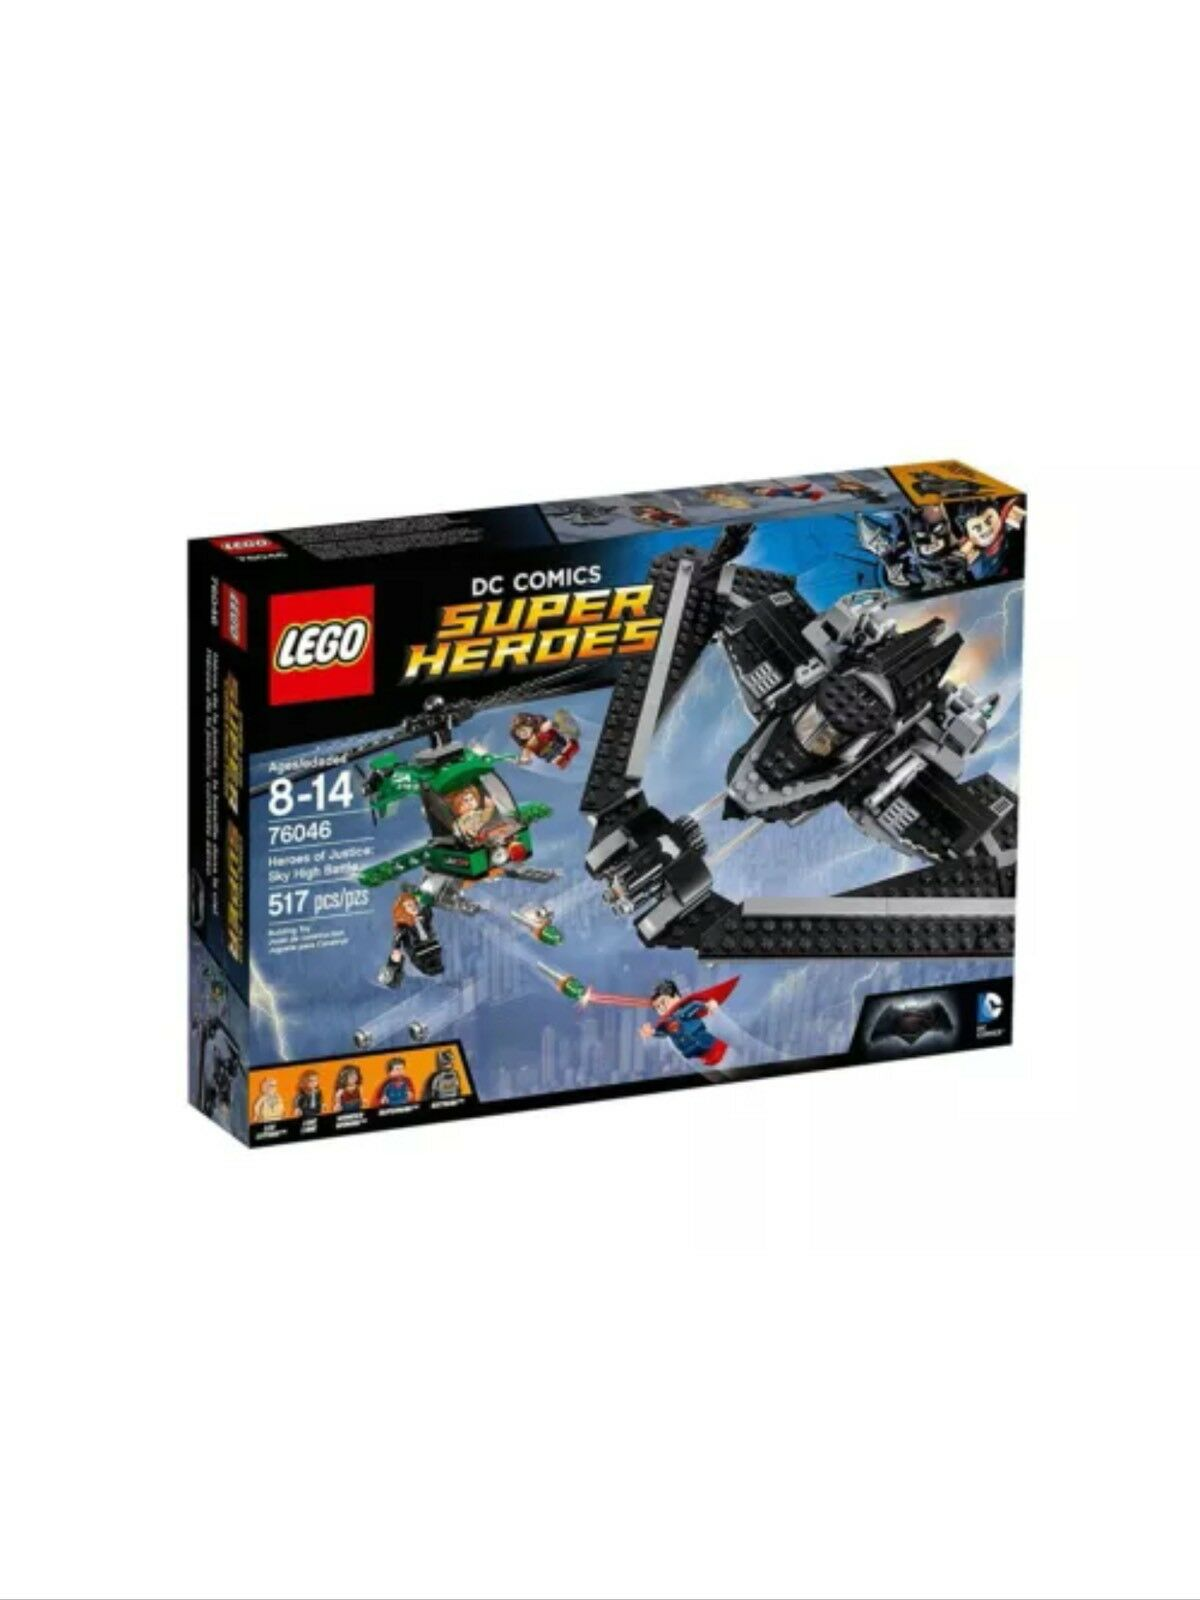 LEGO 76046 BATMAN V SUPERMAN DC SUPER HEROES OF JUSTICE, SKY HIGH BATTLE. WOW